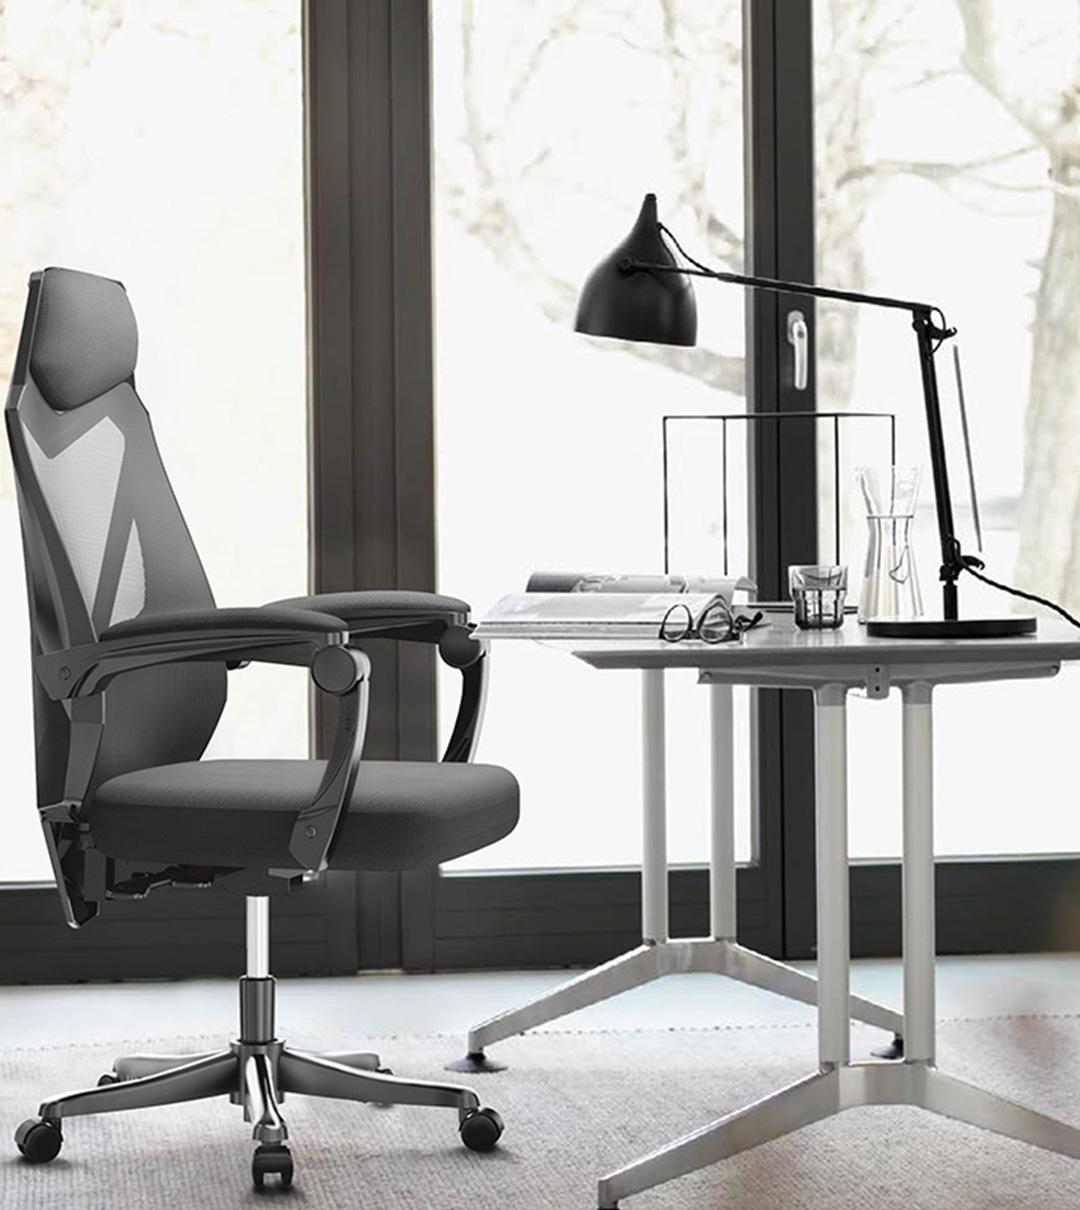 Hbada Computer Chair Diamond Edition